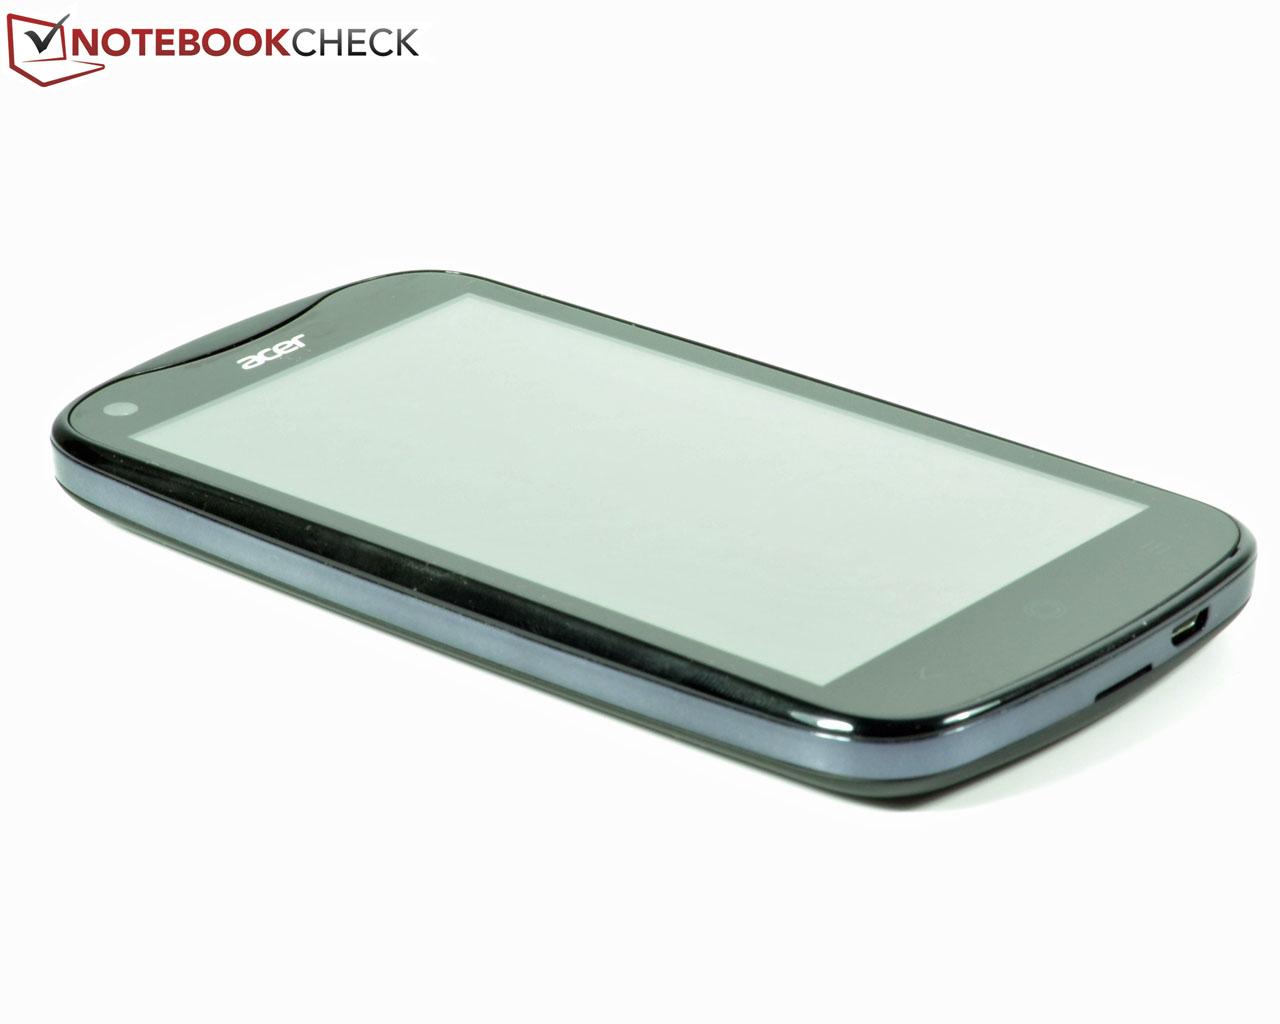 Breve Análisis Del Smartphone Acer Liquid E2 Duo